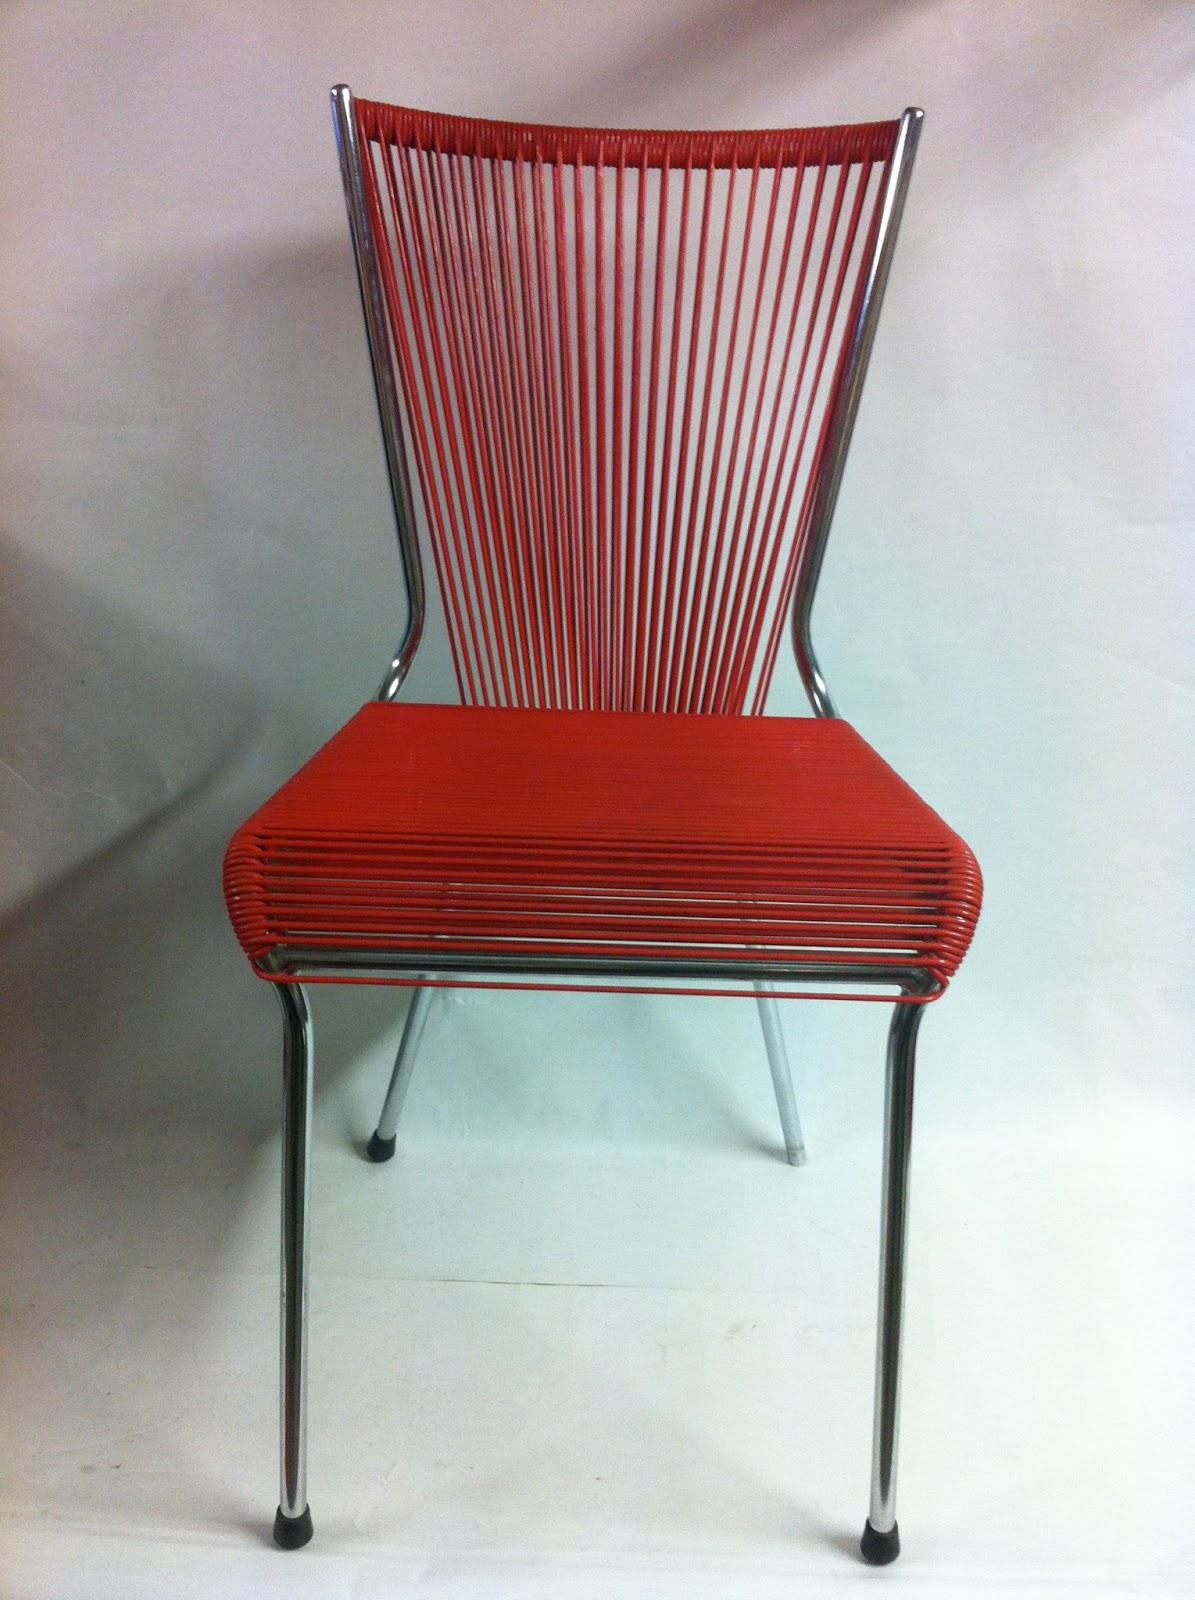 Mobilier scoubidou chaise - Chaise scoubidou vintage ...